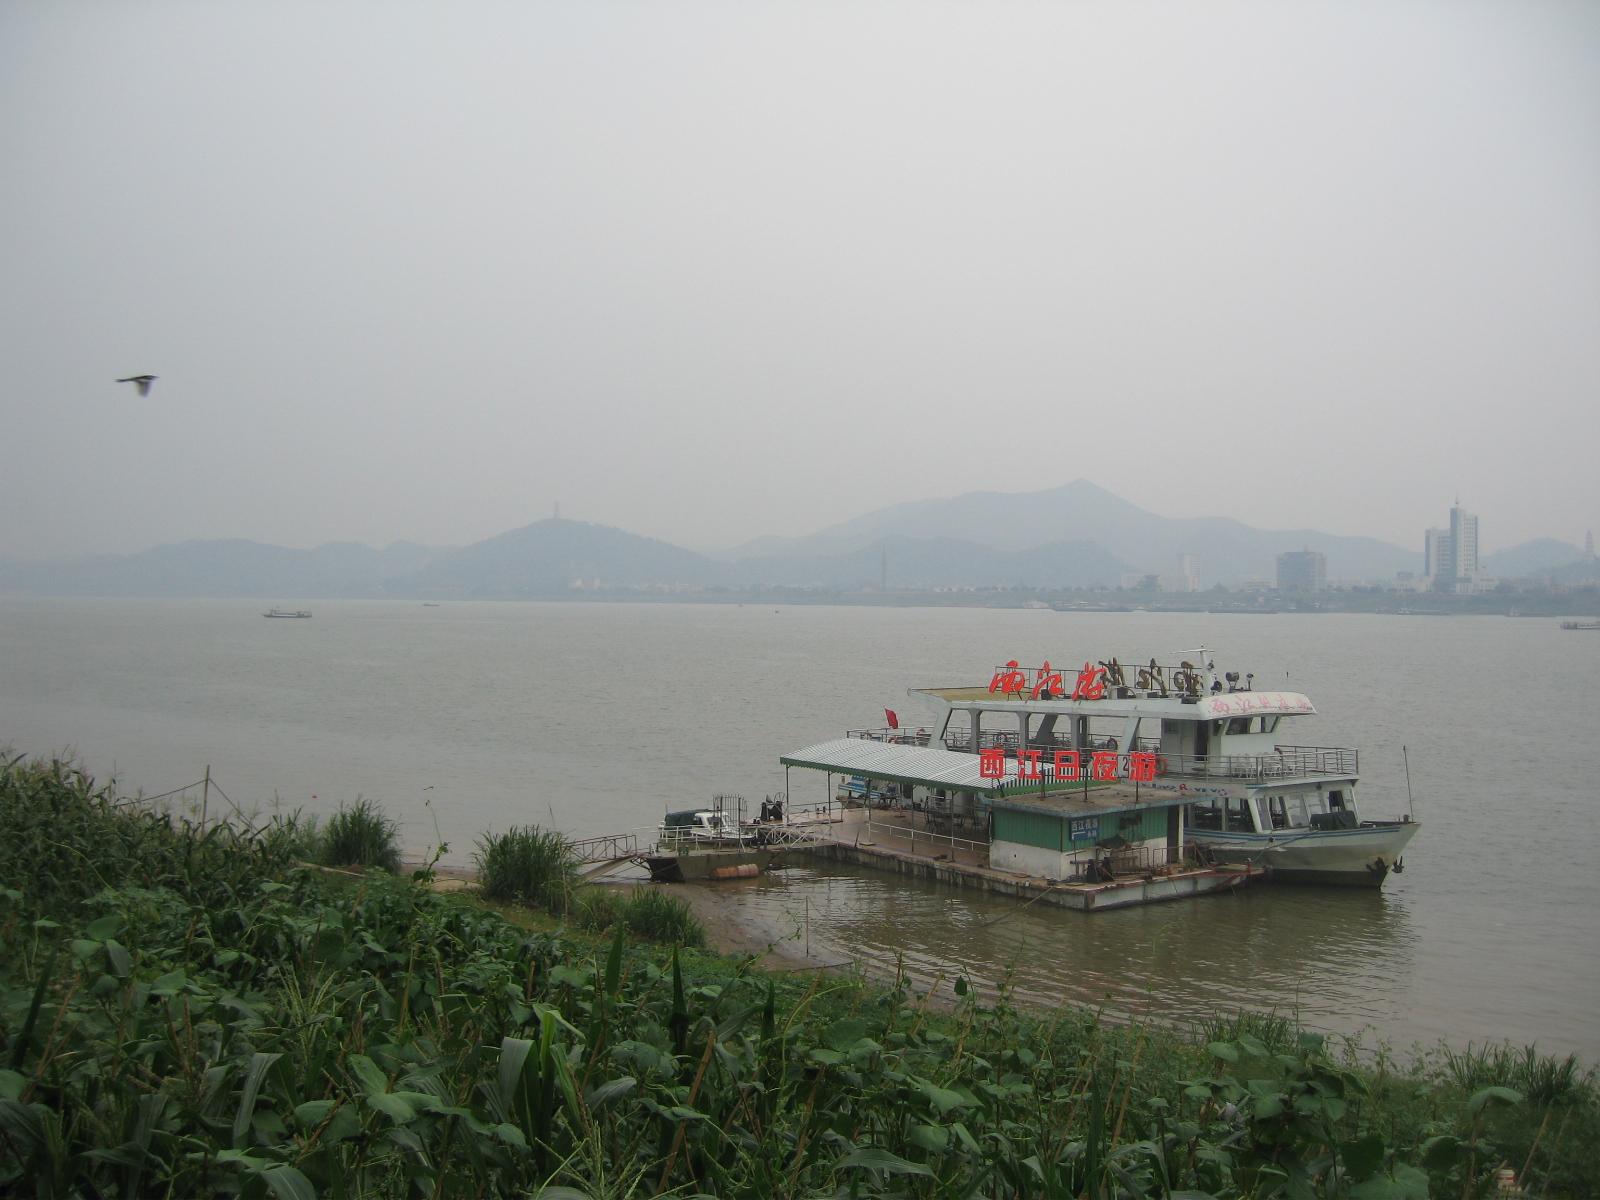 including the Xi River Xi River